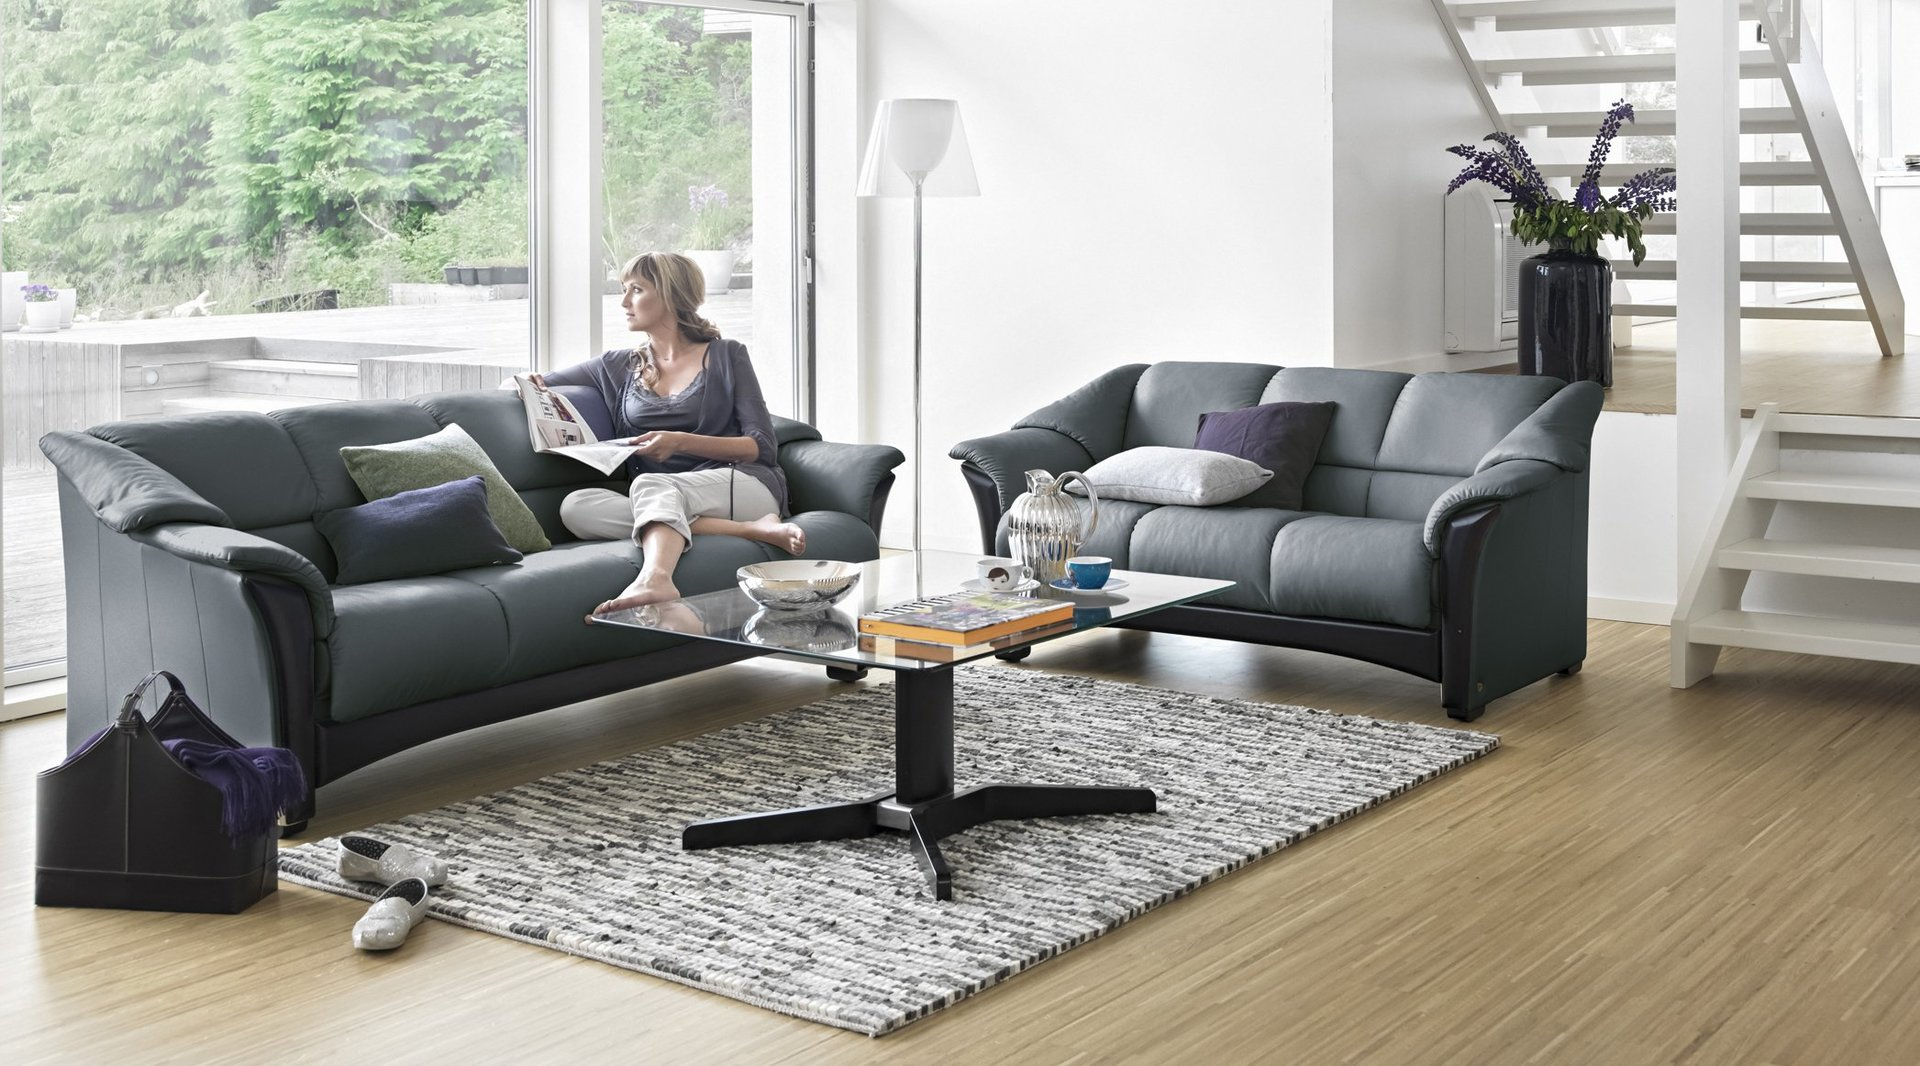 Living Room Furniture Oakland, CA